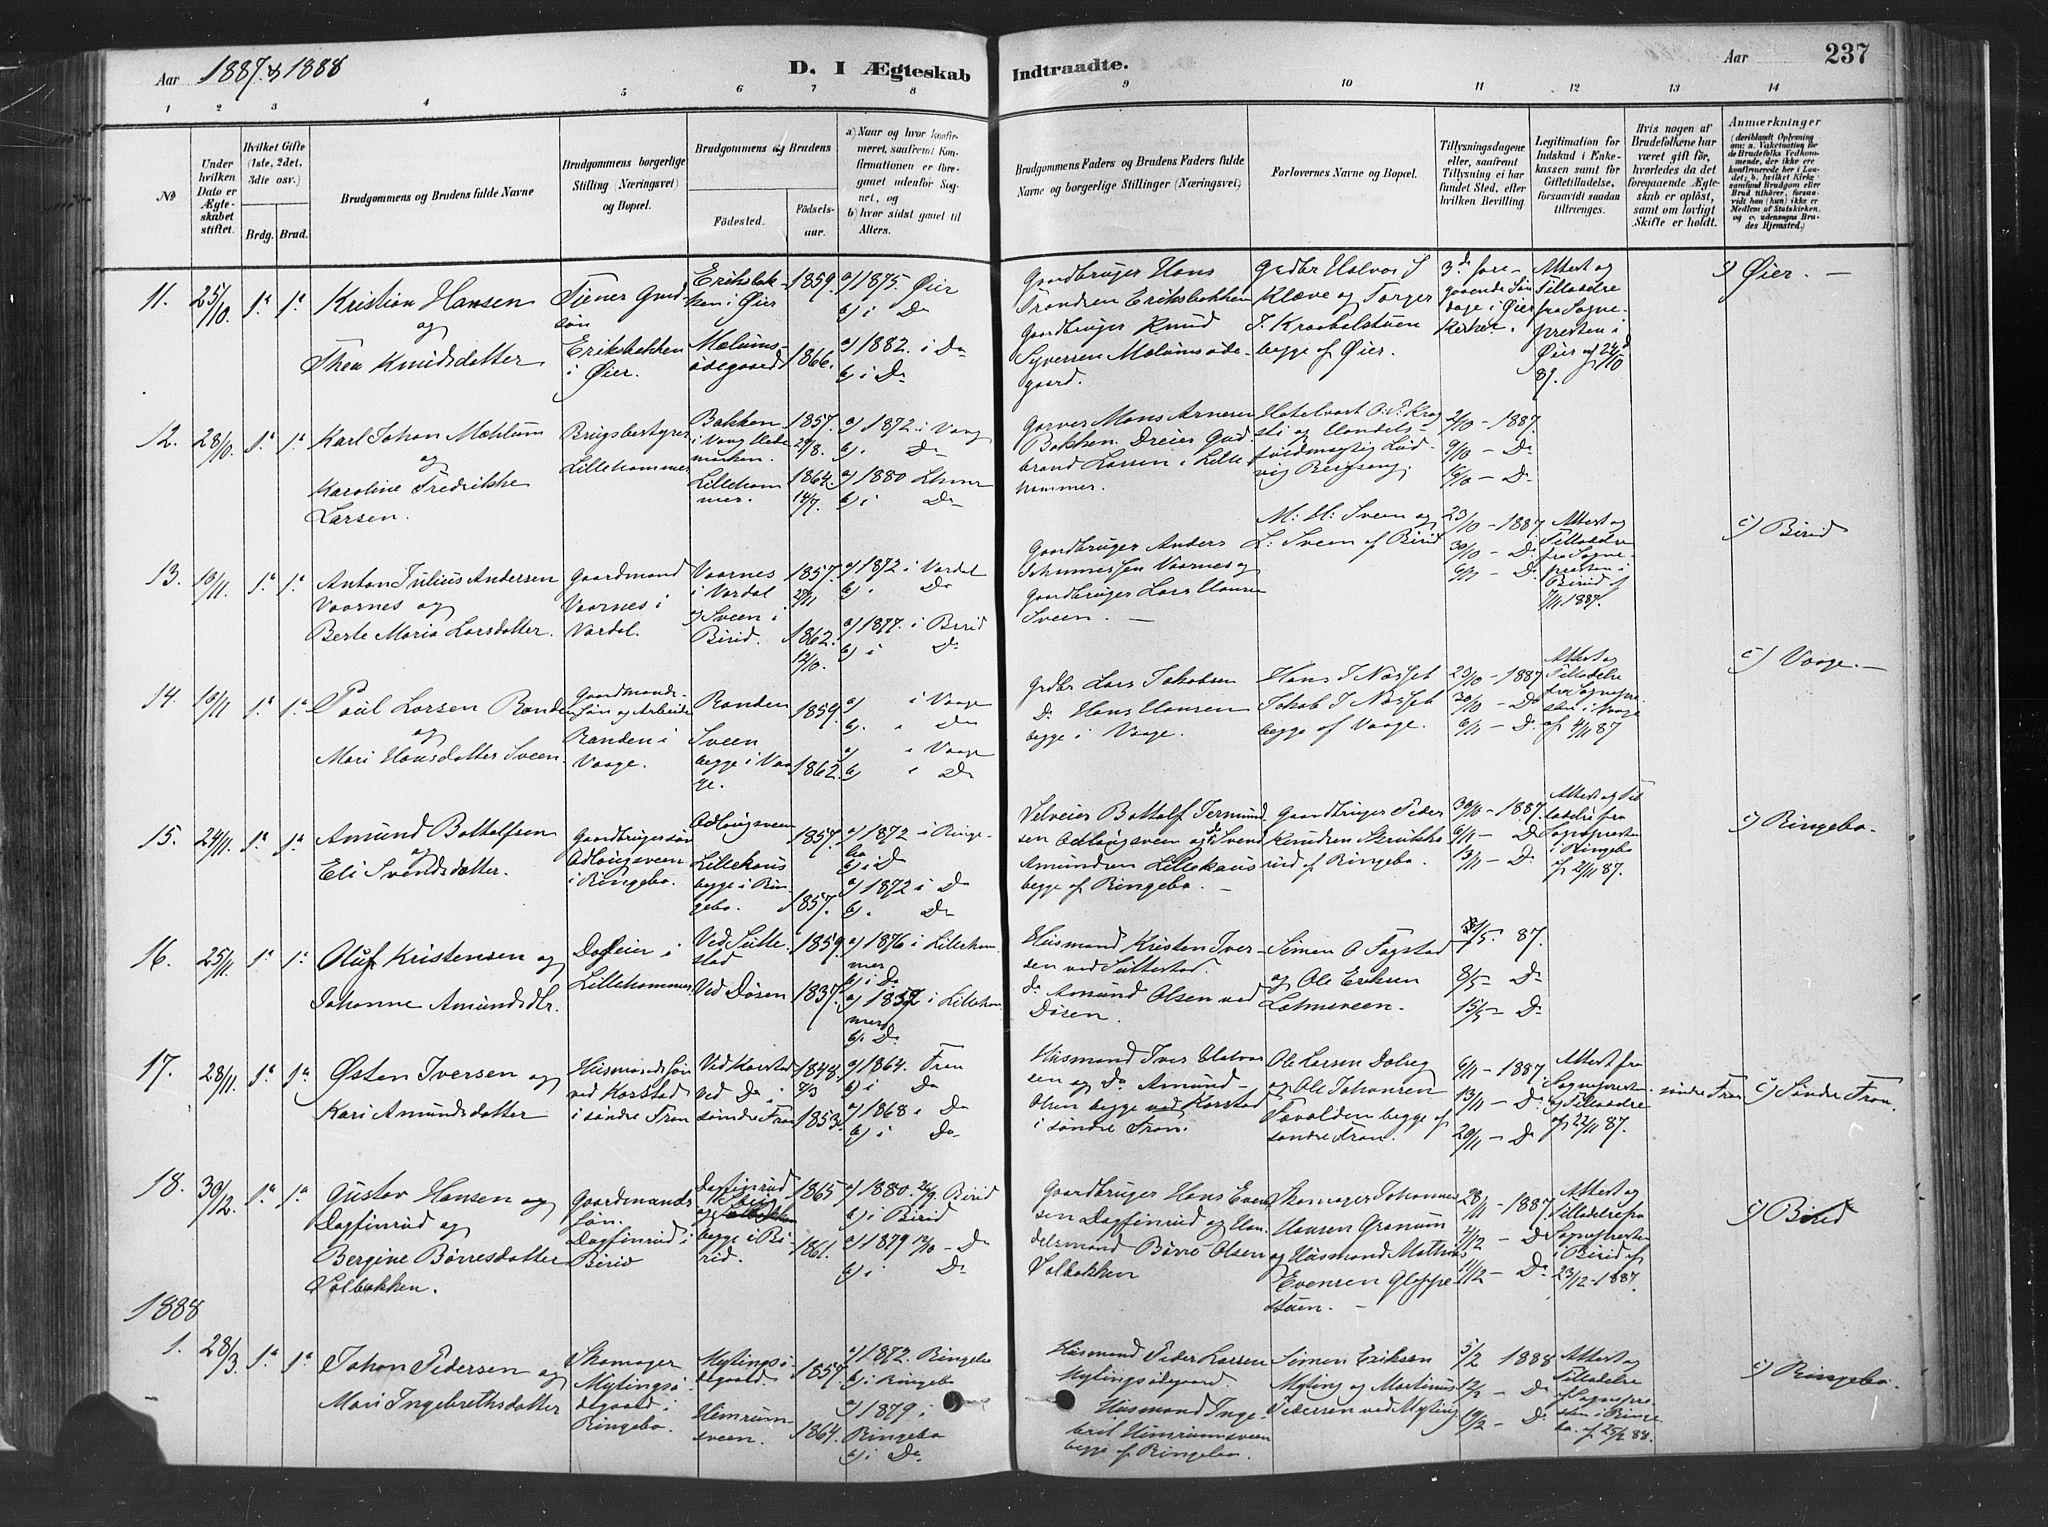 SAH, Fåberg prestekontor, H/Ha/Haa/L0010: Parish register (official) no. 10, 1879-1900, p. 237